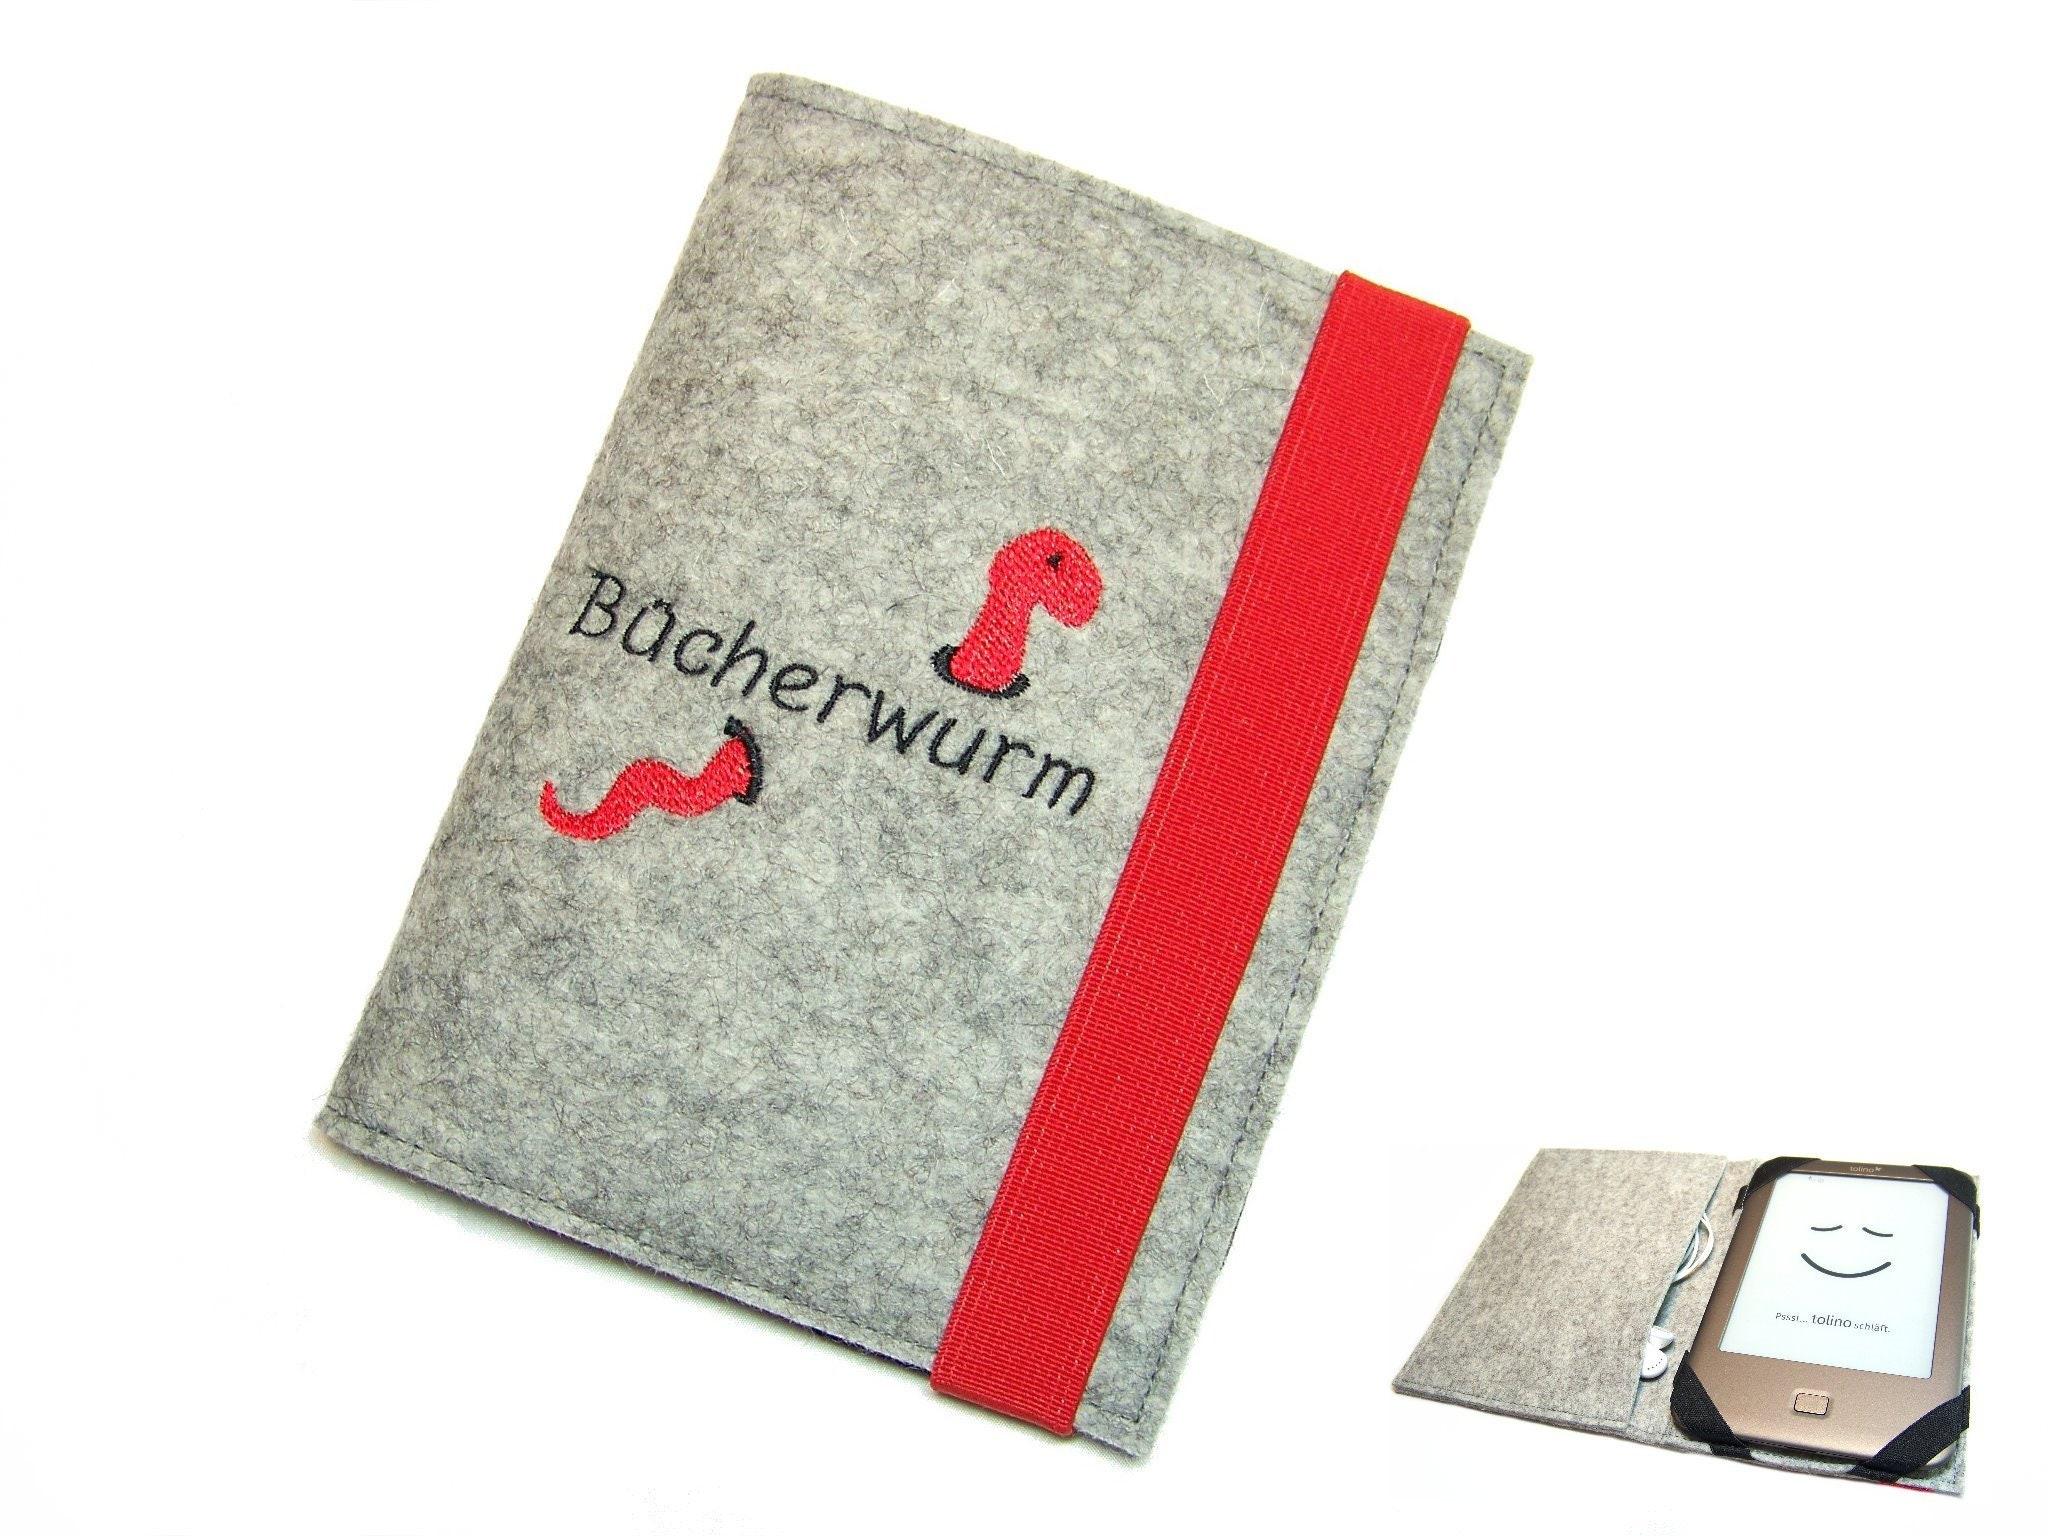 Hinged ebook Reader ereader tablet sleeve bookworm embroidery wool felt  felt measure up to 8 0